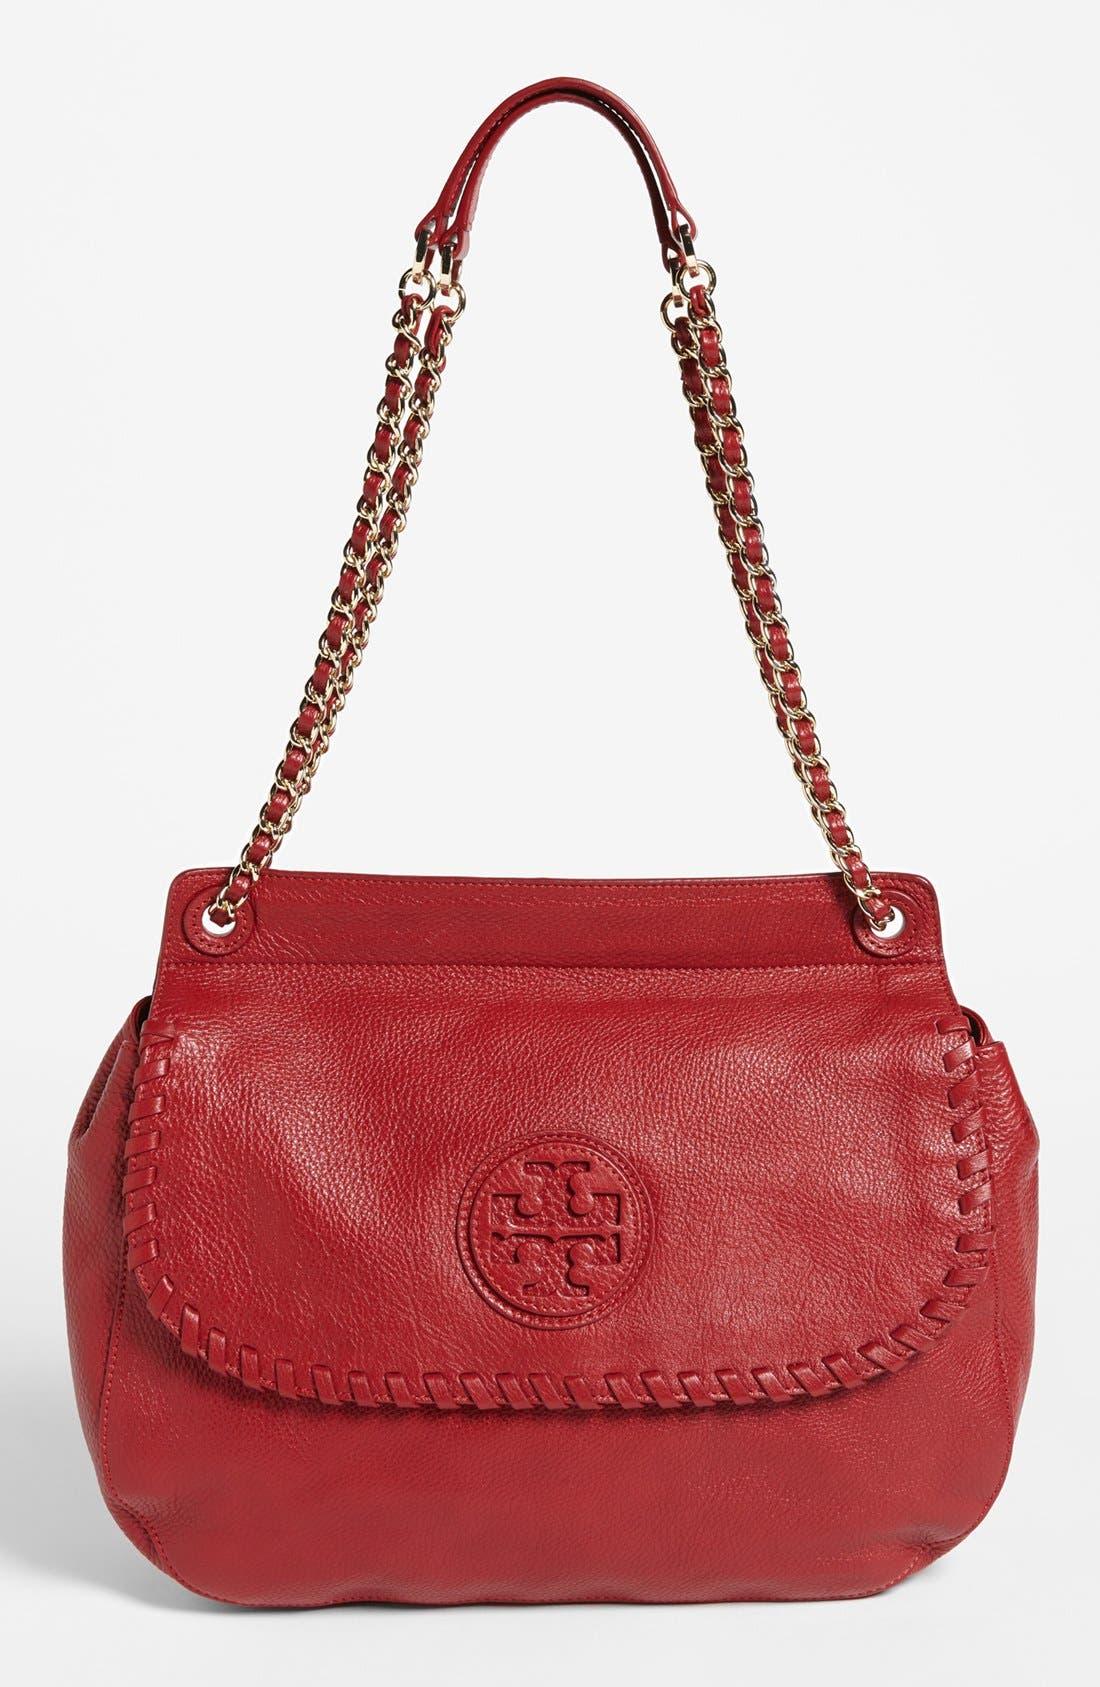 Alternate Image 1 Selected - Tory Burch 'Marion' Leather Saddlebag